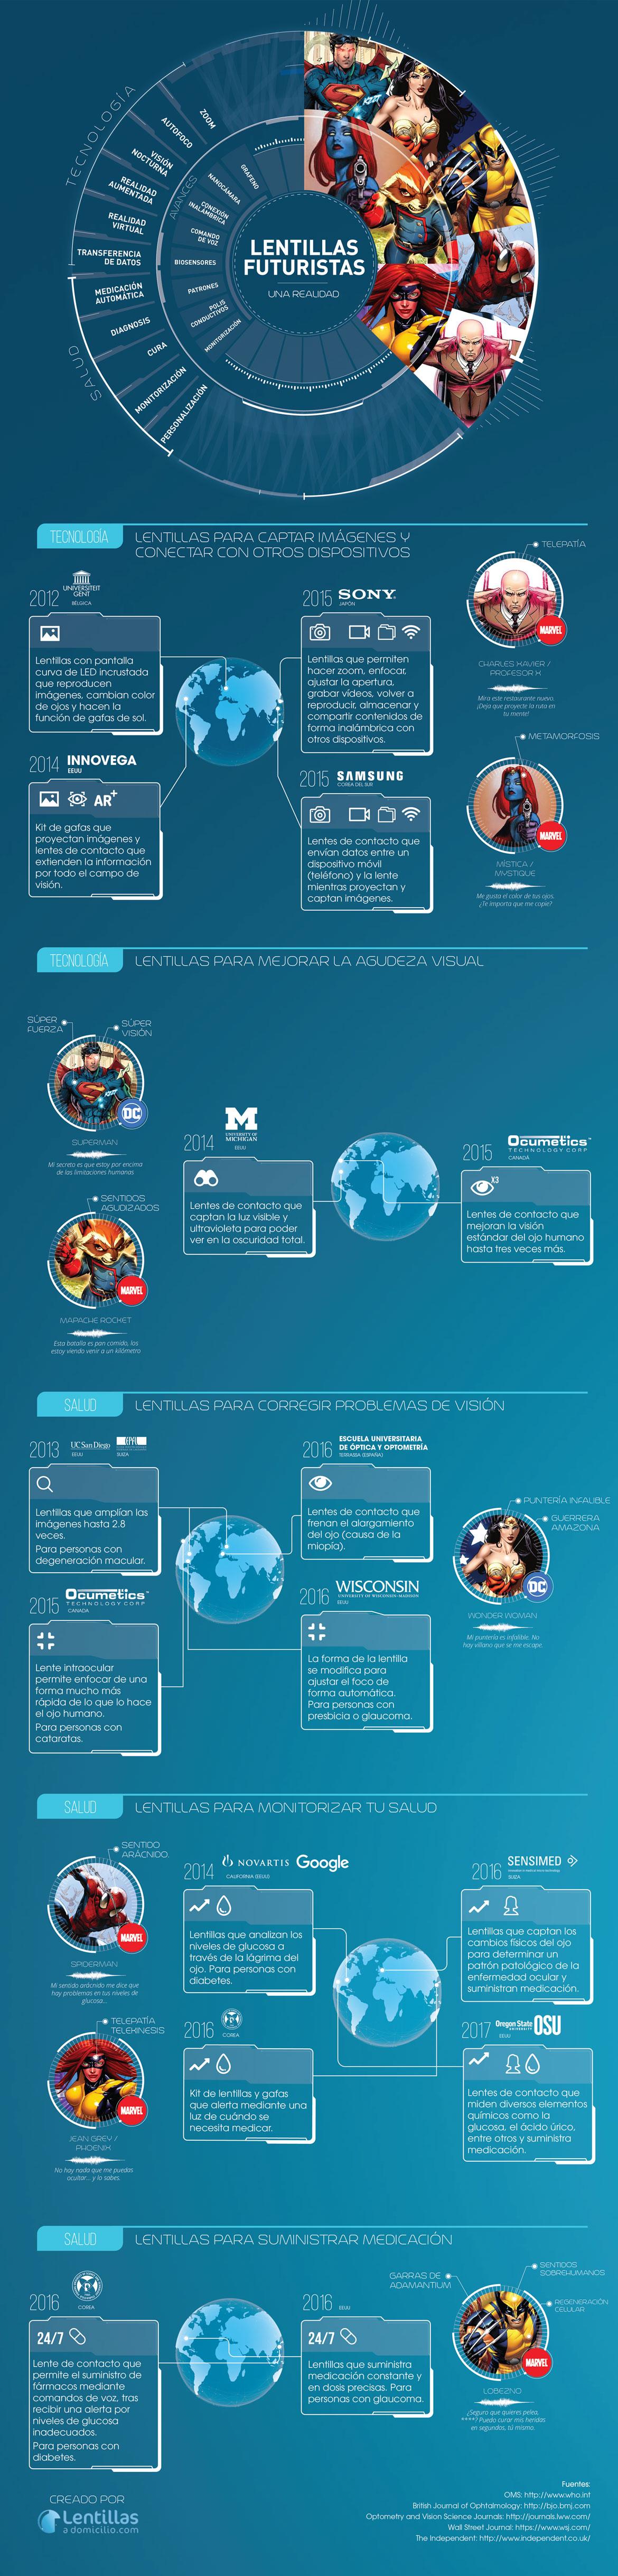 infografia-lentillas-inteligentes